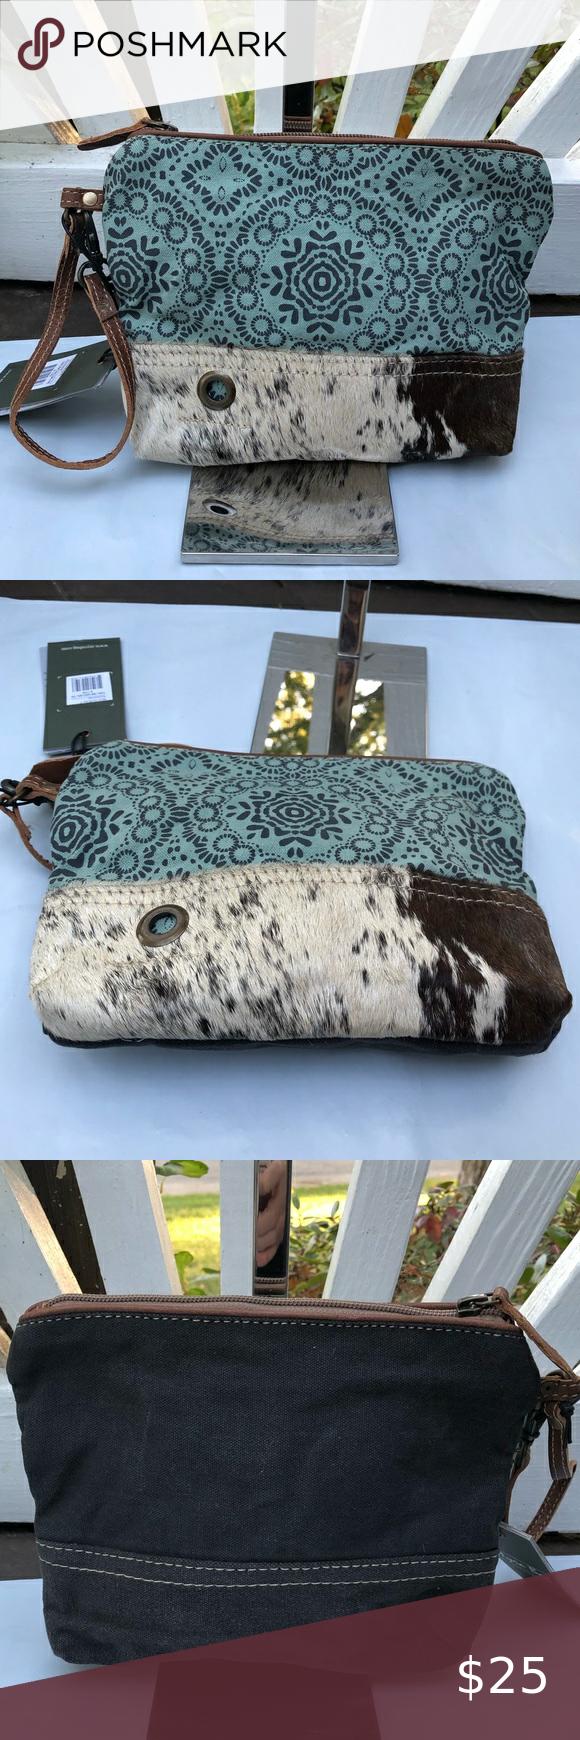 Myra Bag Small Pouch Wristlet Green Floral In 2020 Small Bags Small Pouches Bags Ladys fur handbags real mink fur bag purse bags handbag bag diagonal bag blue. pinterest